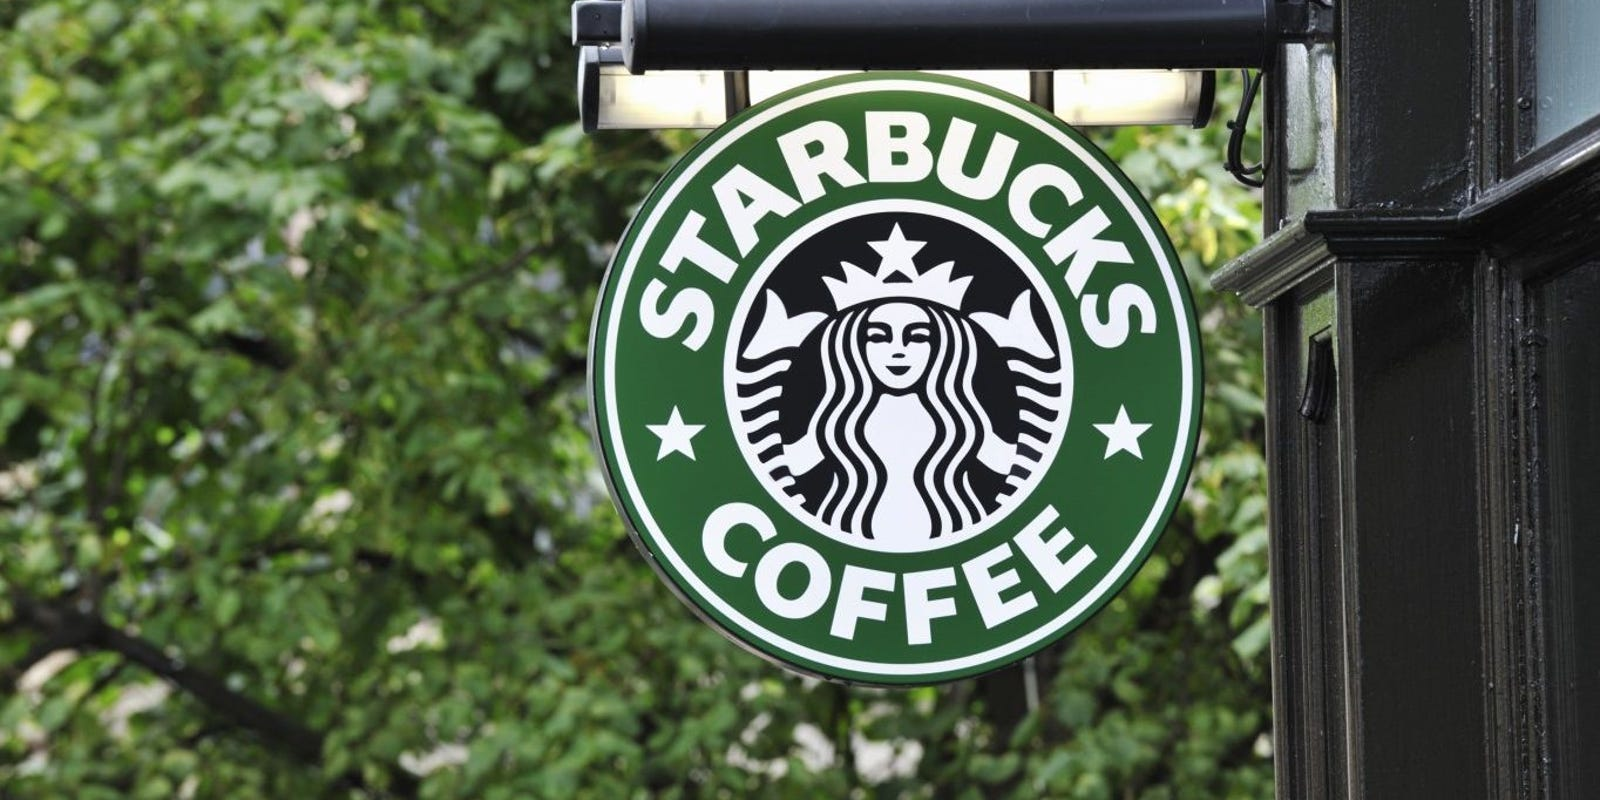 Starbucks encouraging their employees to go vote on Election Day